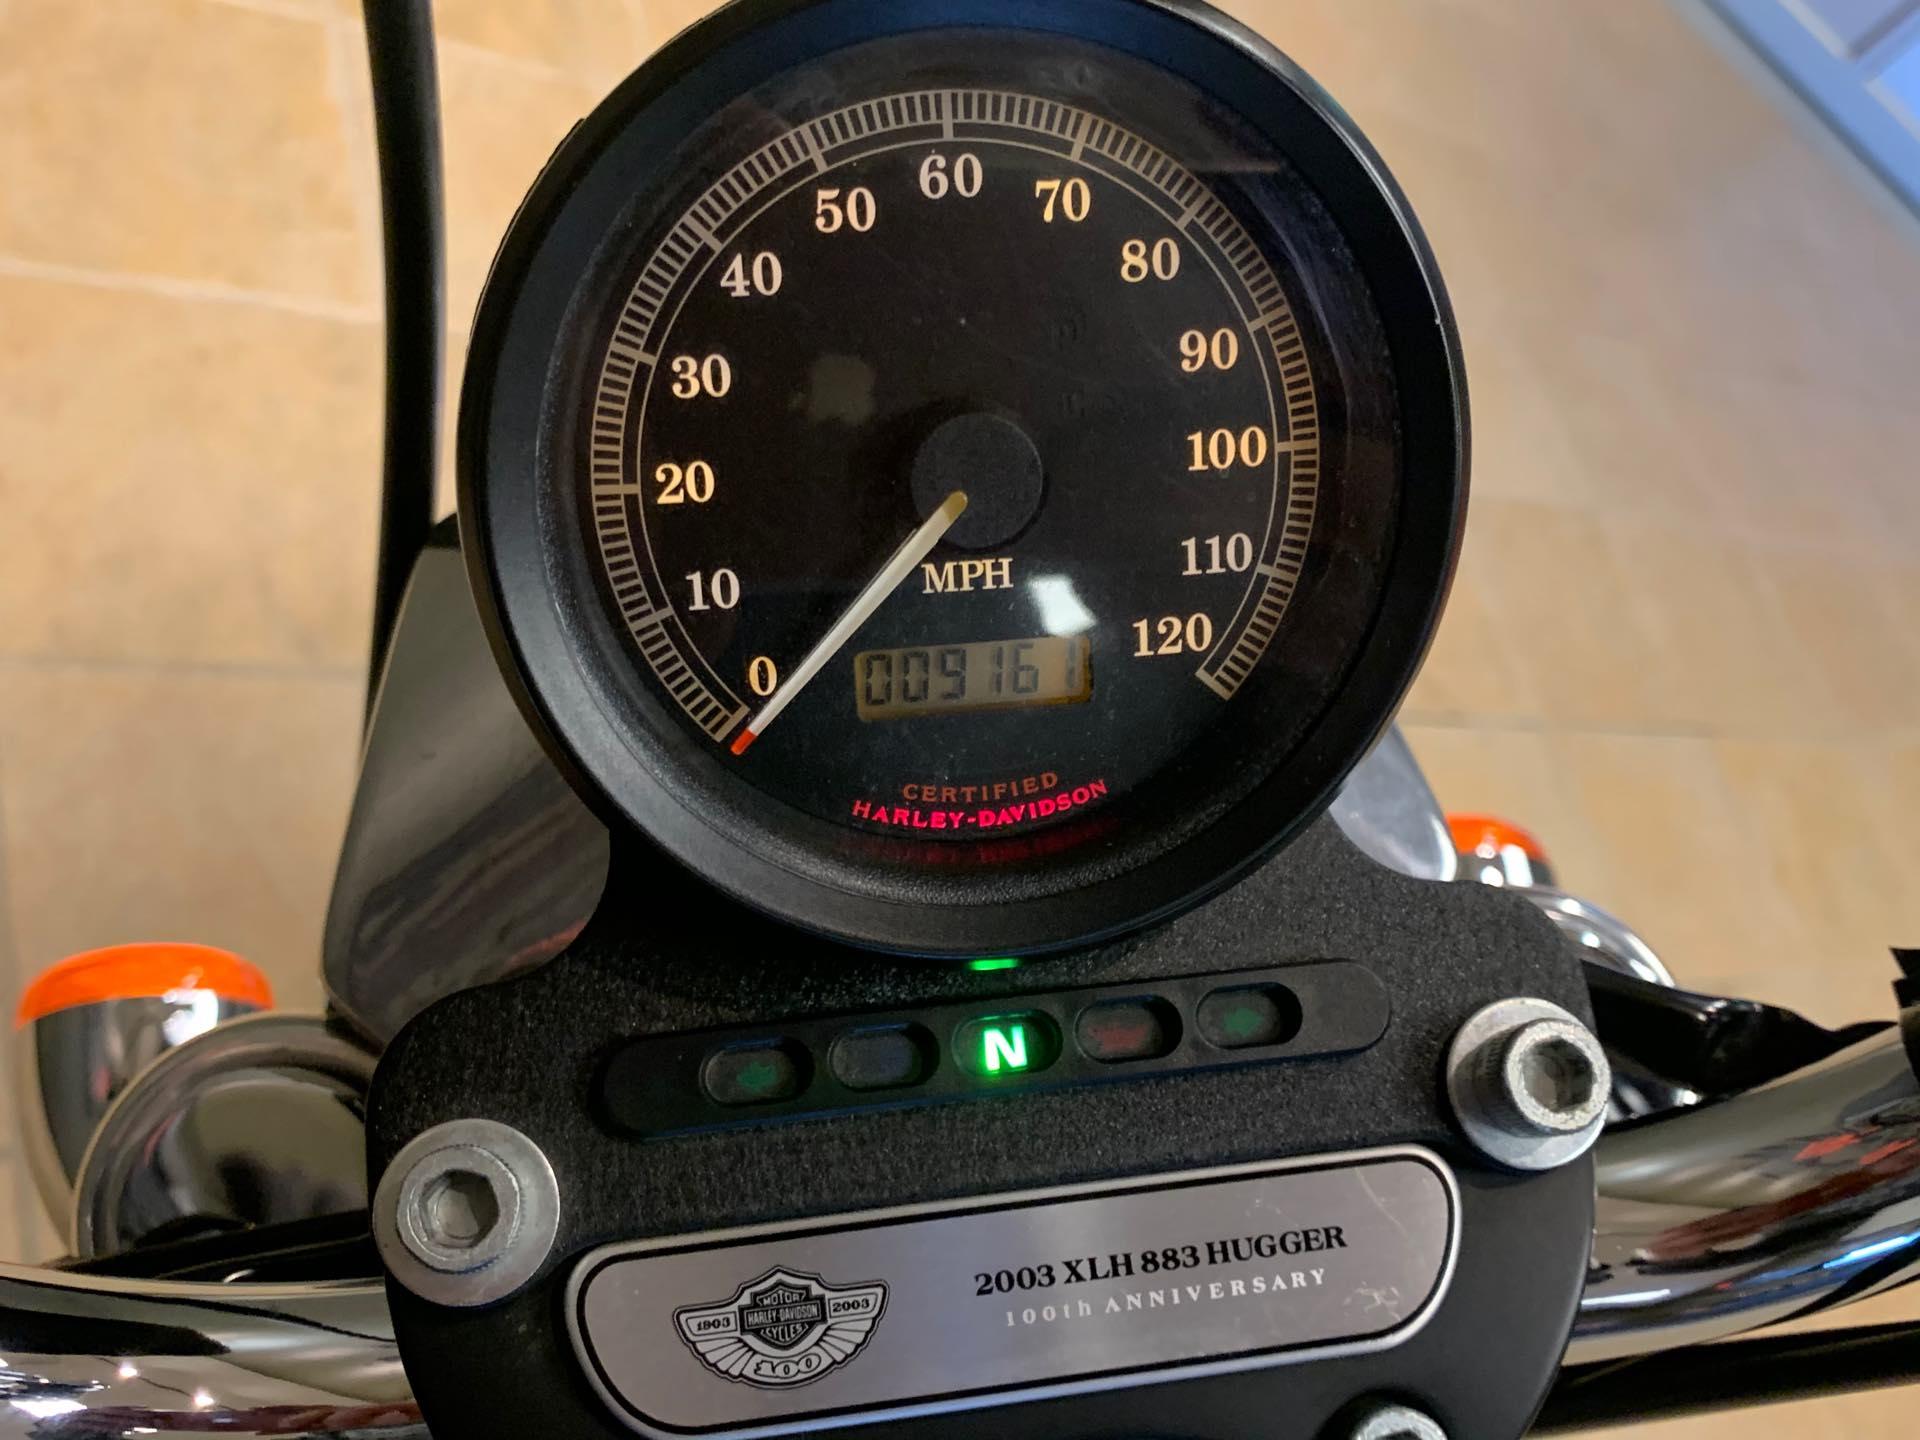 2003 Harley Davidson XL883 at Loess Hills Harley-Davidson